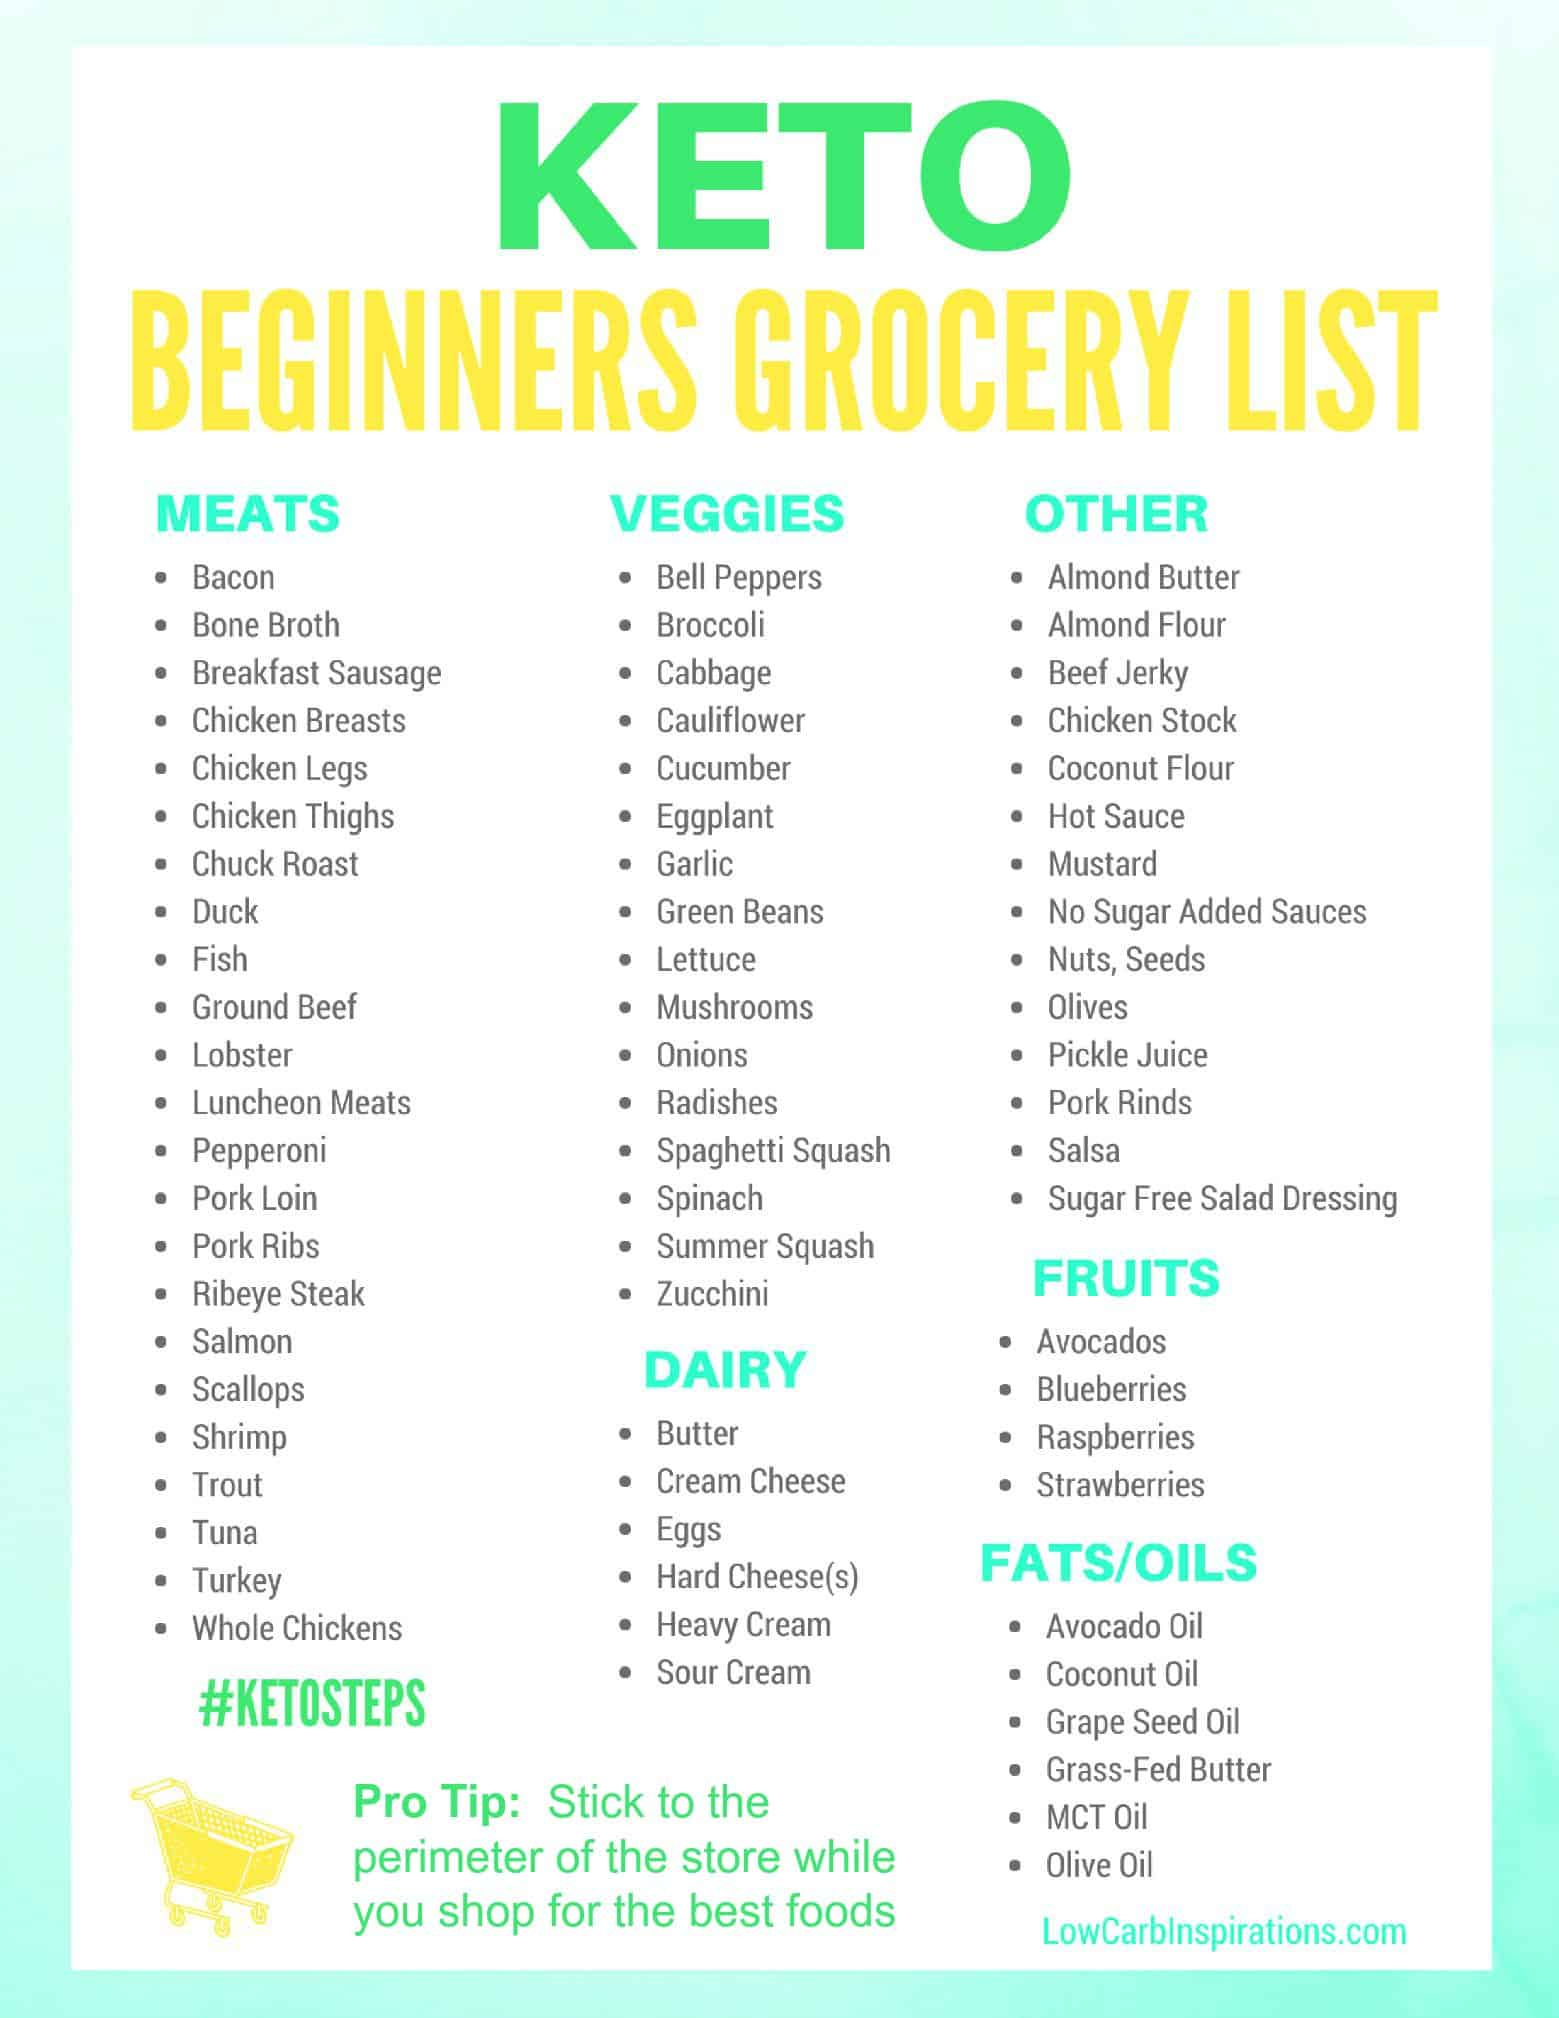 Keto Grocery List For Beginners - Isavea2Z - Free Printable Keto Food List